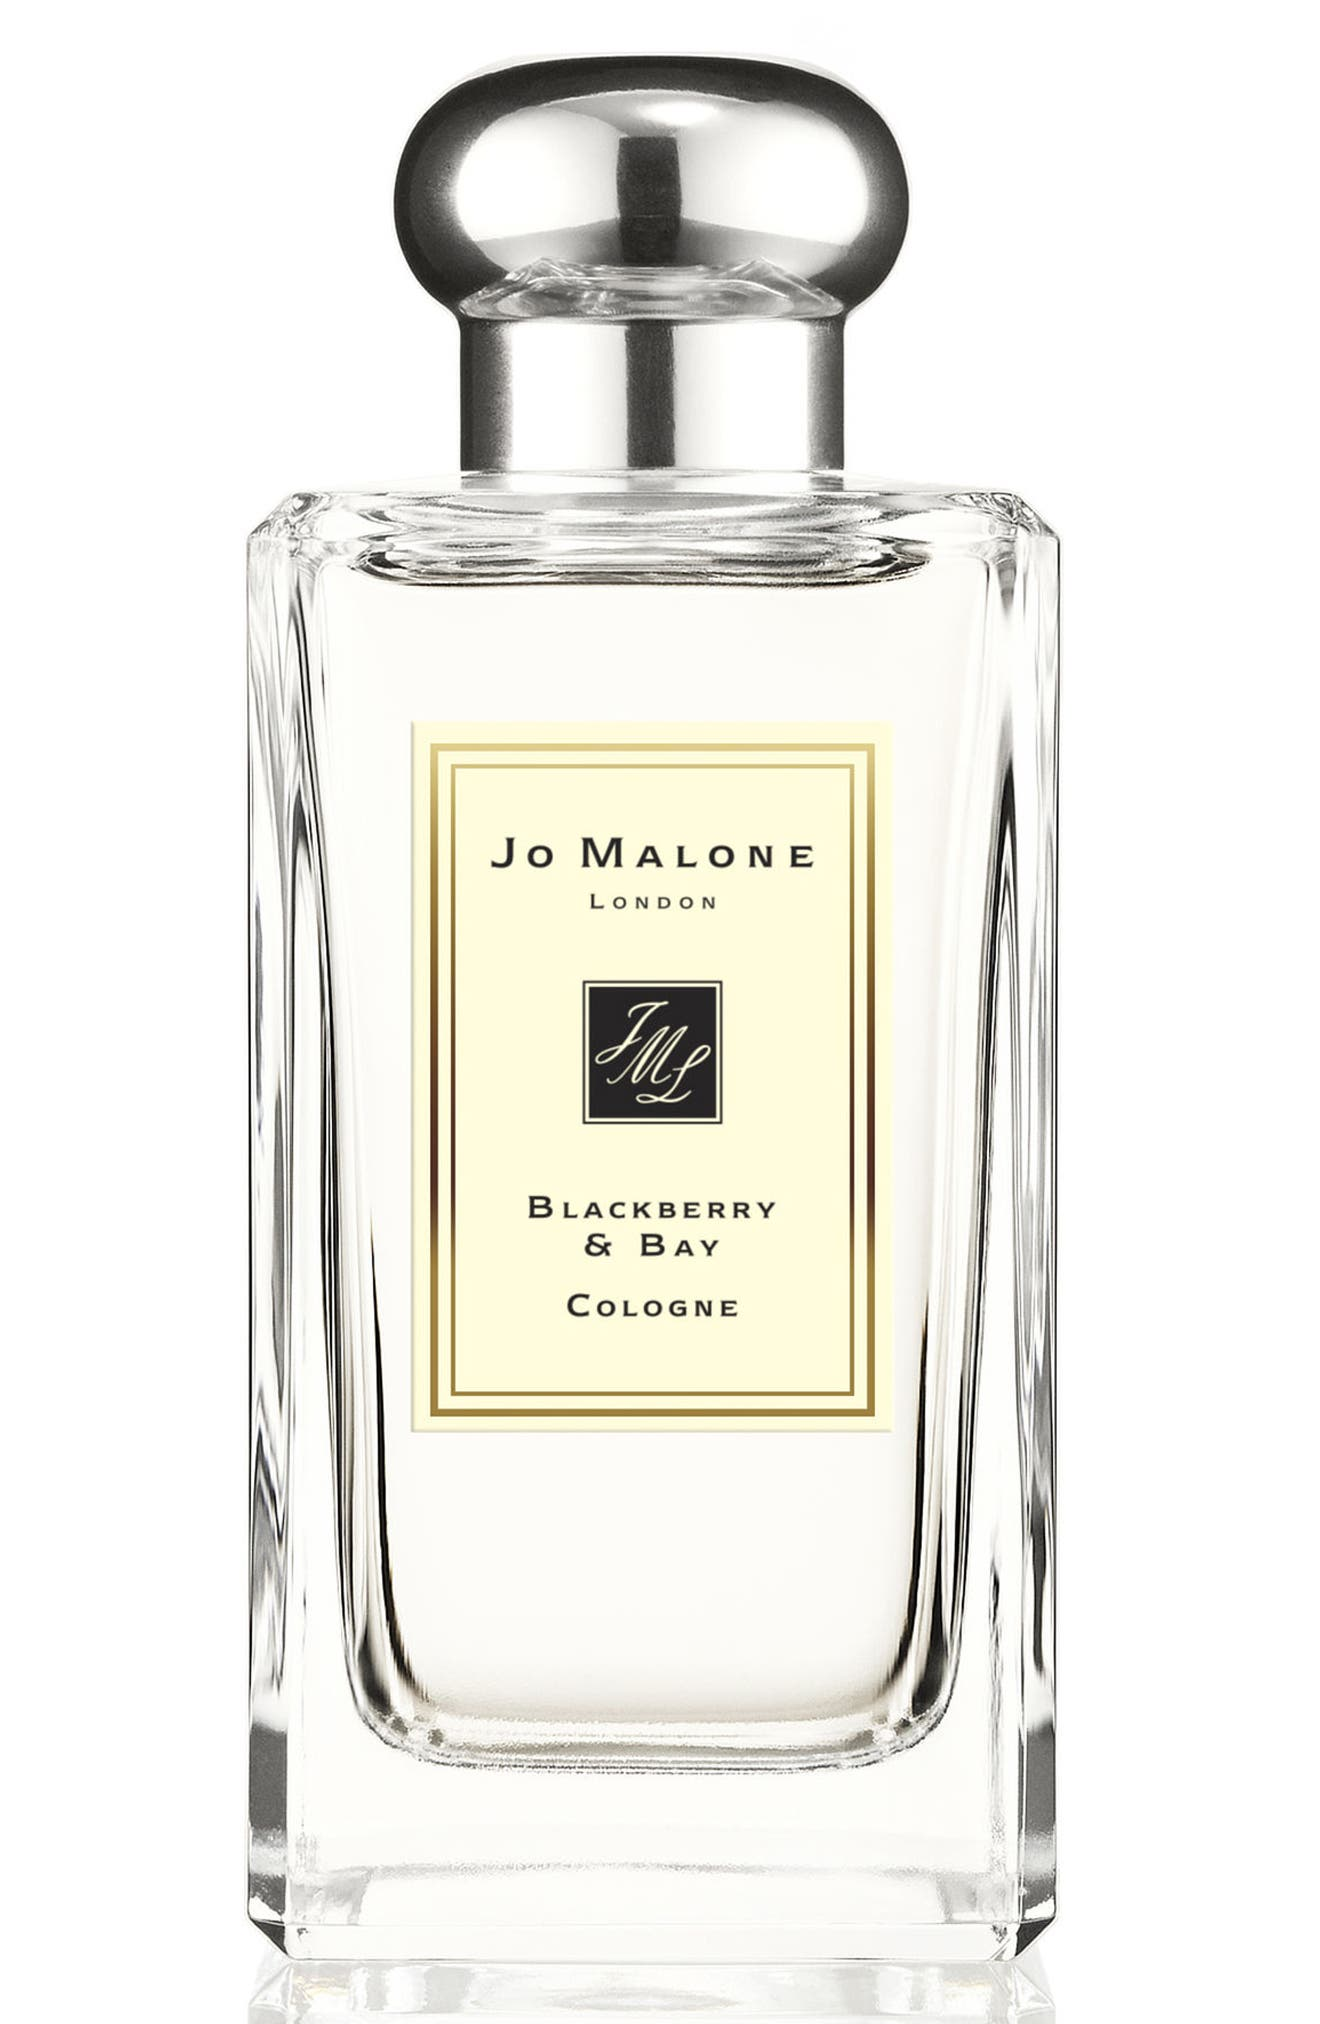 Alternate Image 1 Selected - Jo Malone London™ 'Blackberry & Bay' Cologne (3.4 oz.)